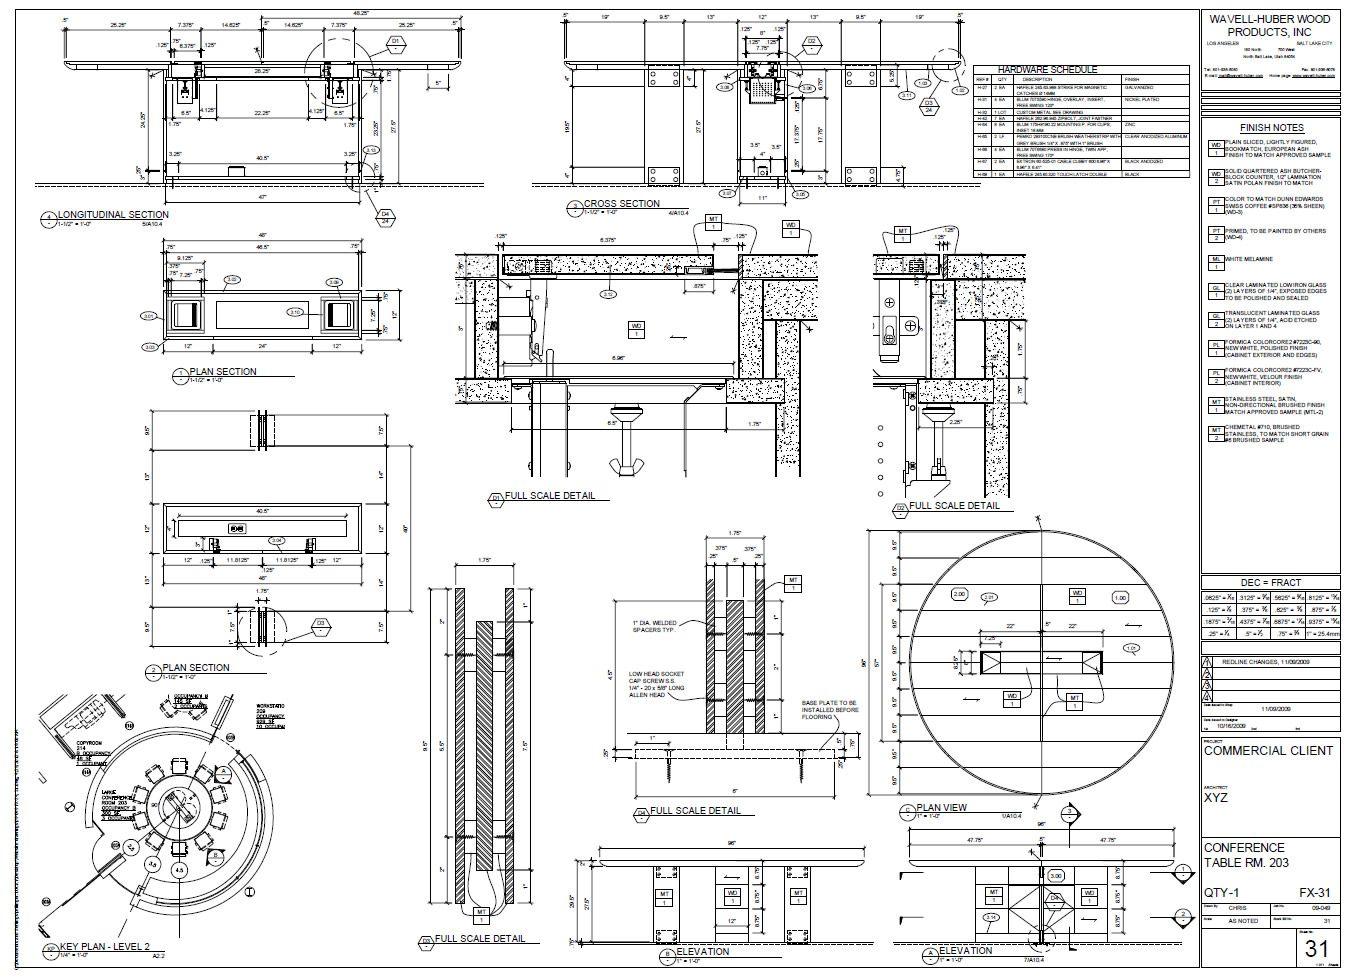 Cadkitchenplans com millwork shop drawings cabinet shop drawings - Cadkitchenplans Com Millwork Shop Drawings Cabinet Shop Drawings 20